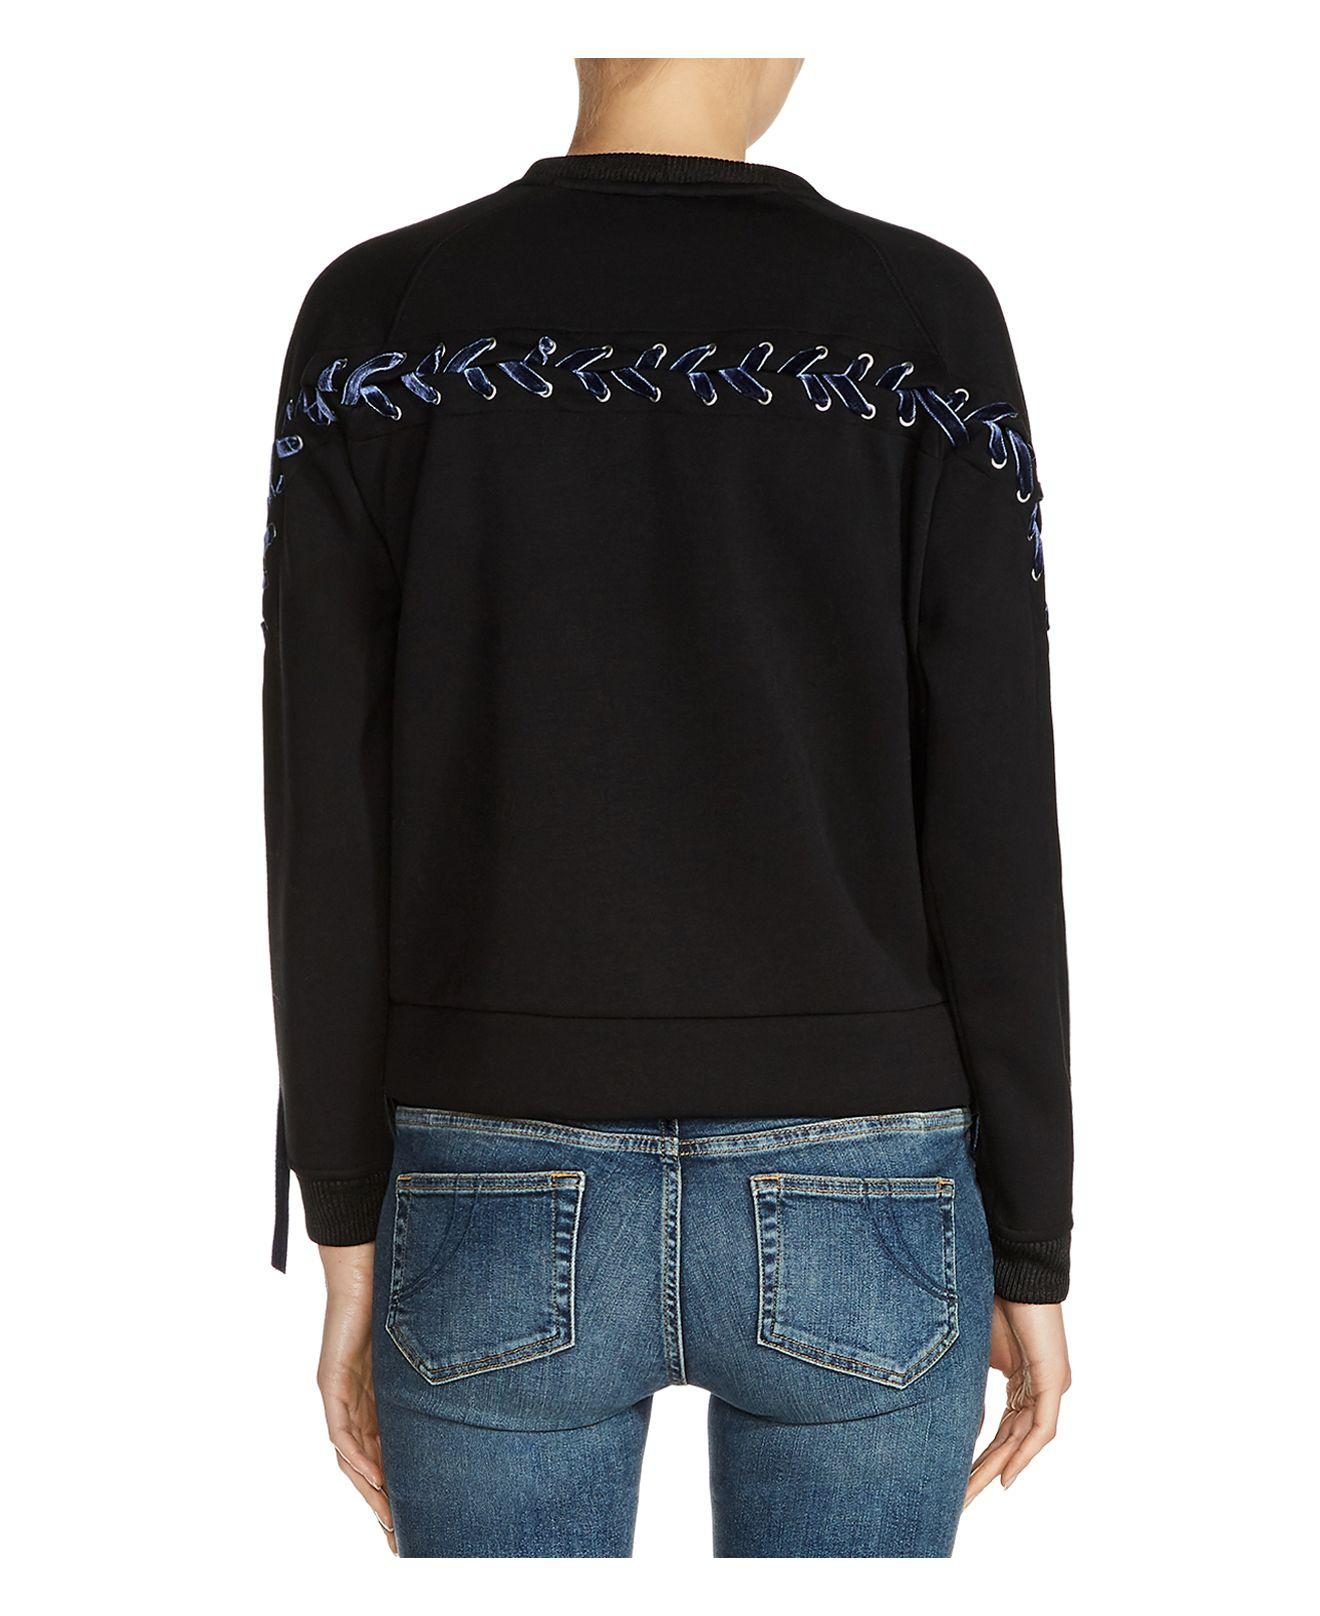 daddadb643 Lyst - Maje Triangle Lace-up Detail Sweatshirt in Black